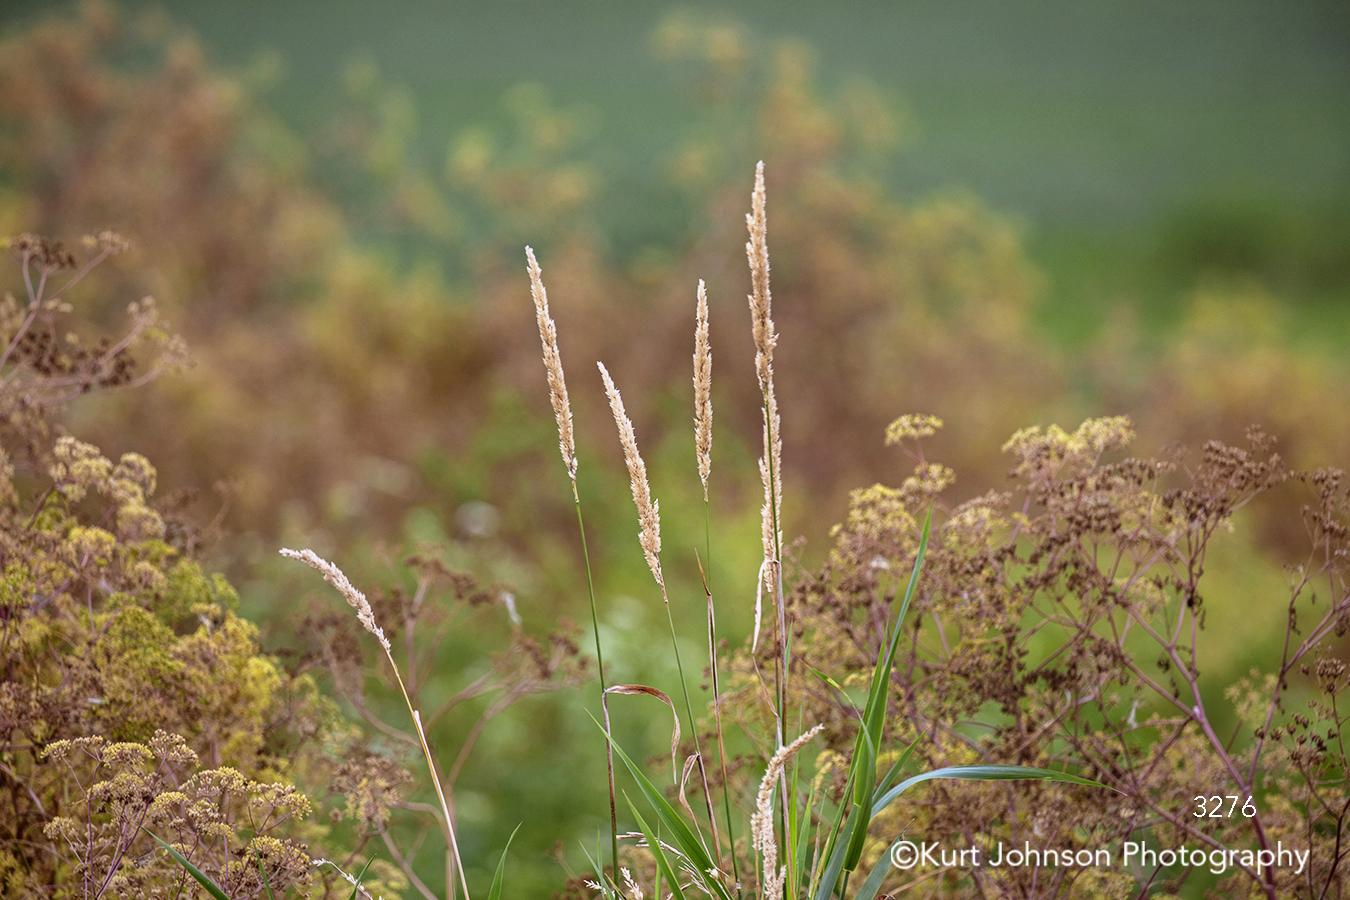 green brown gold grass grasses field macro closeup detail midwest